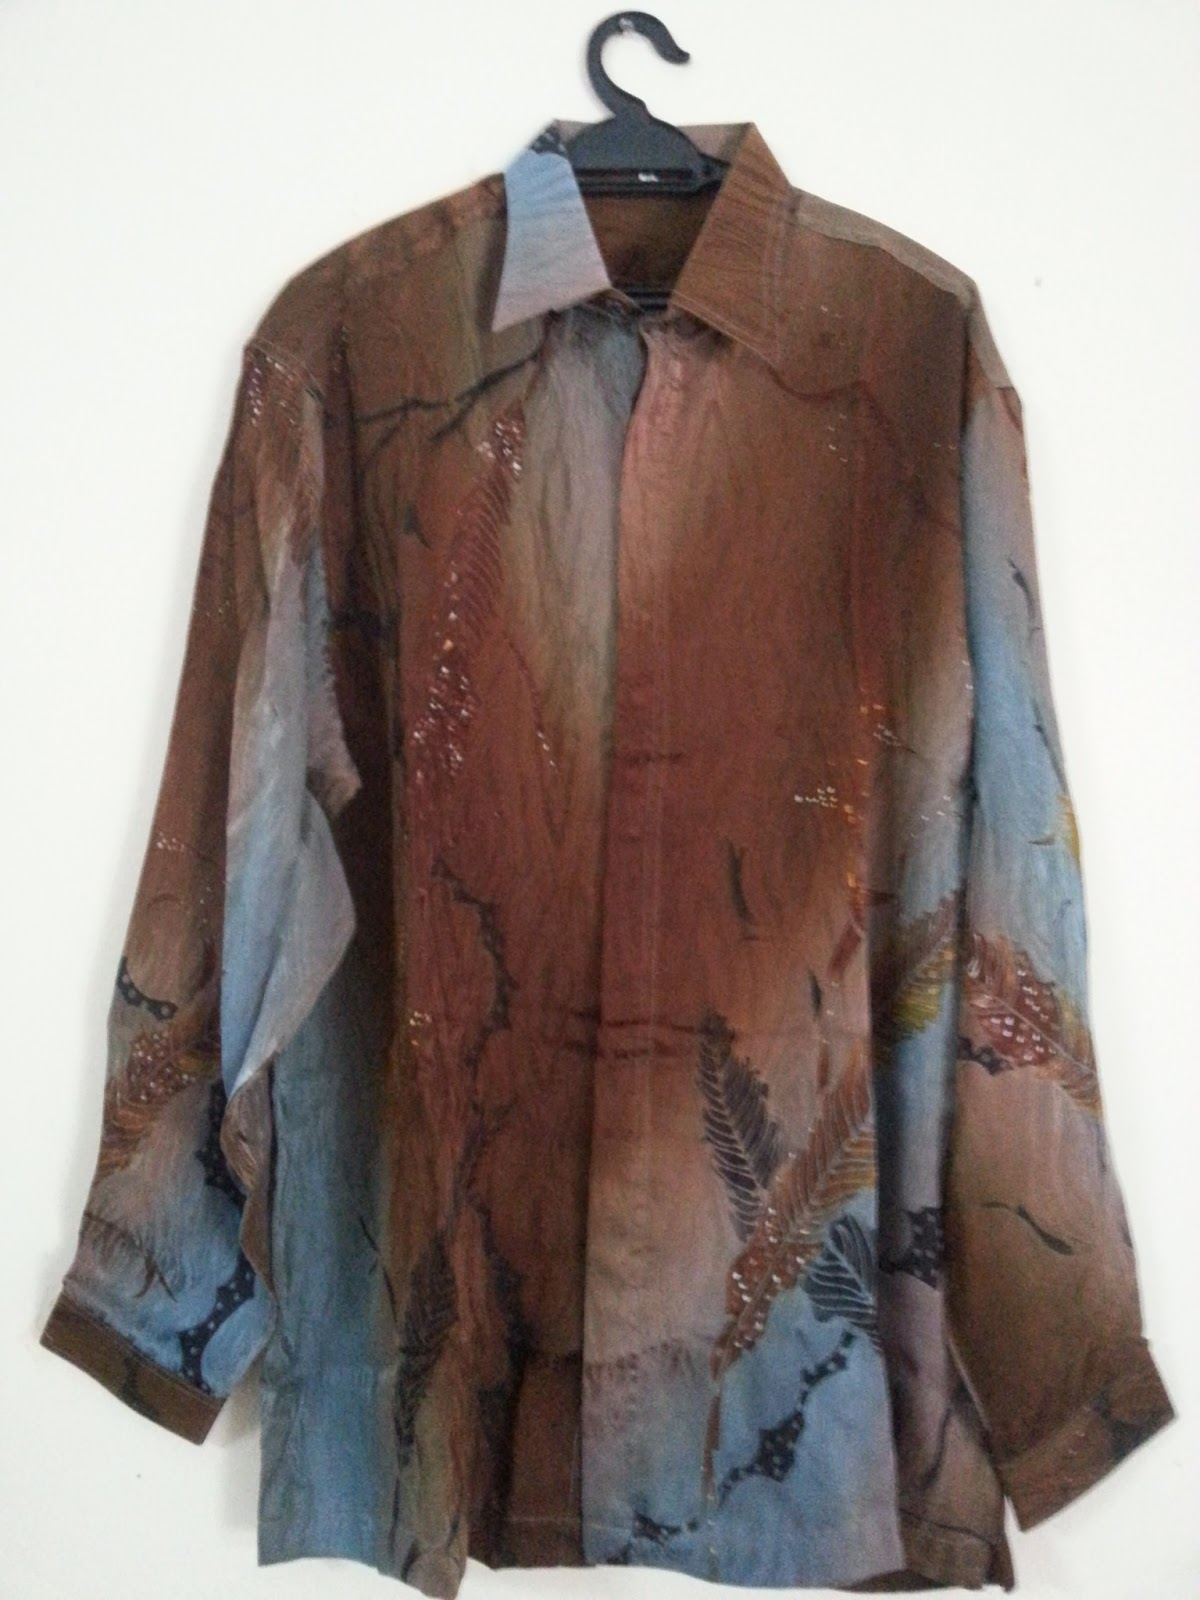 Prelovesales Jualan Pakaian Terpakai  Cantik